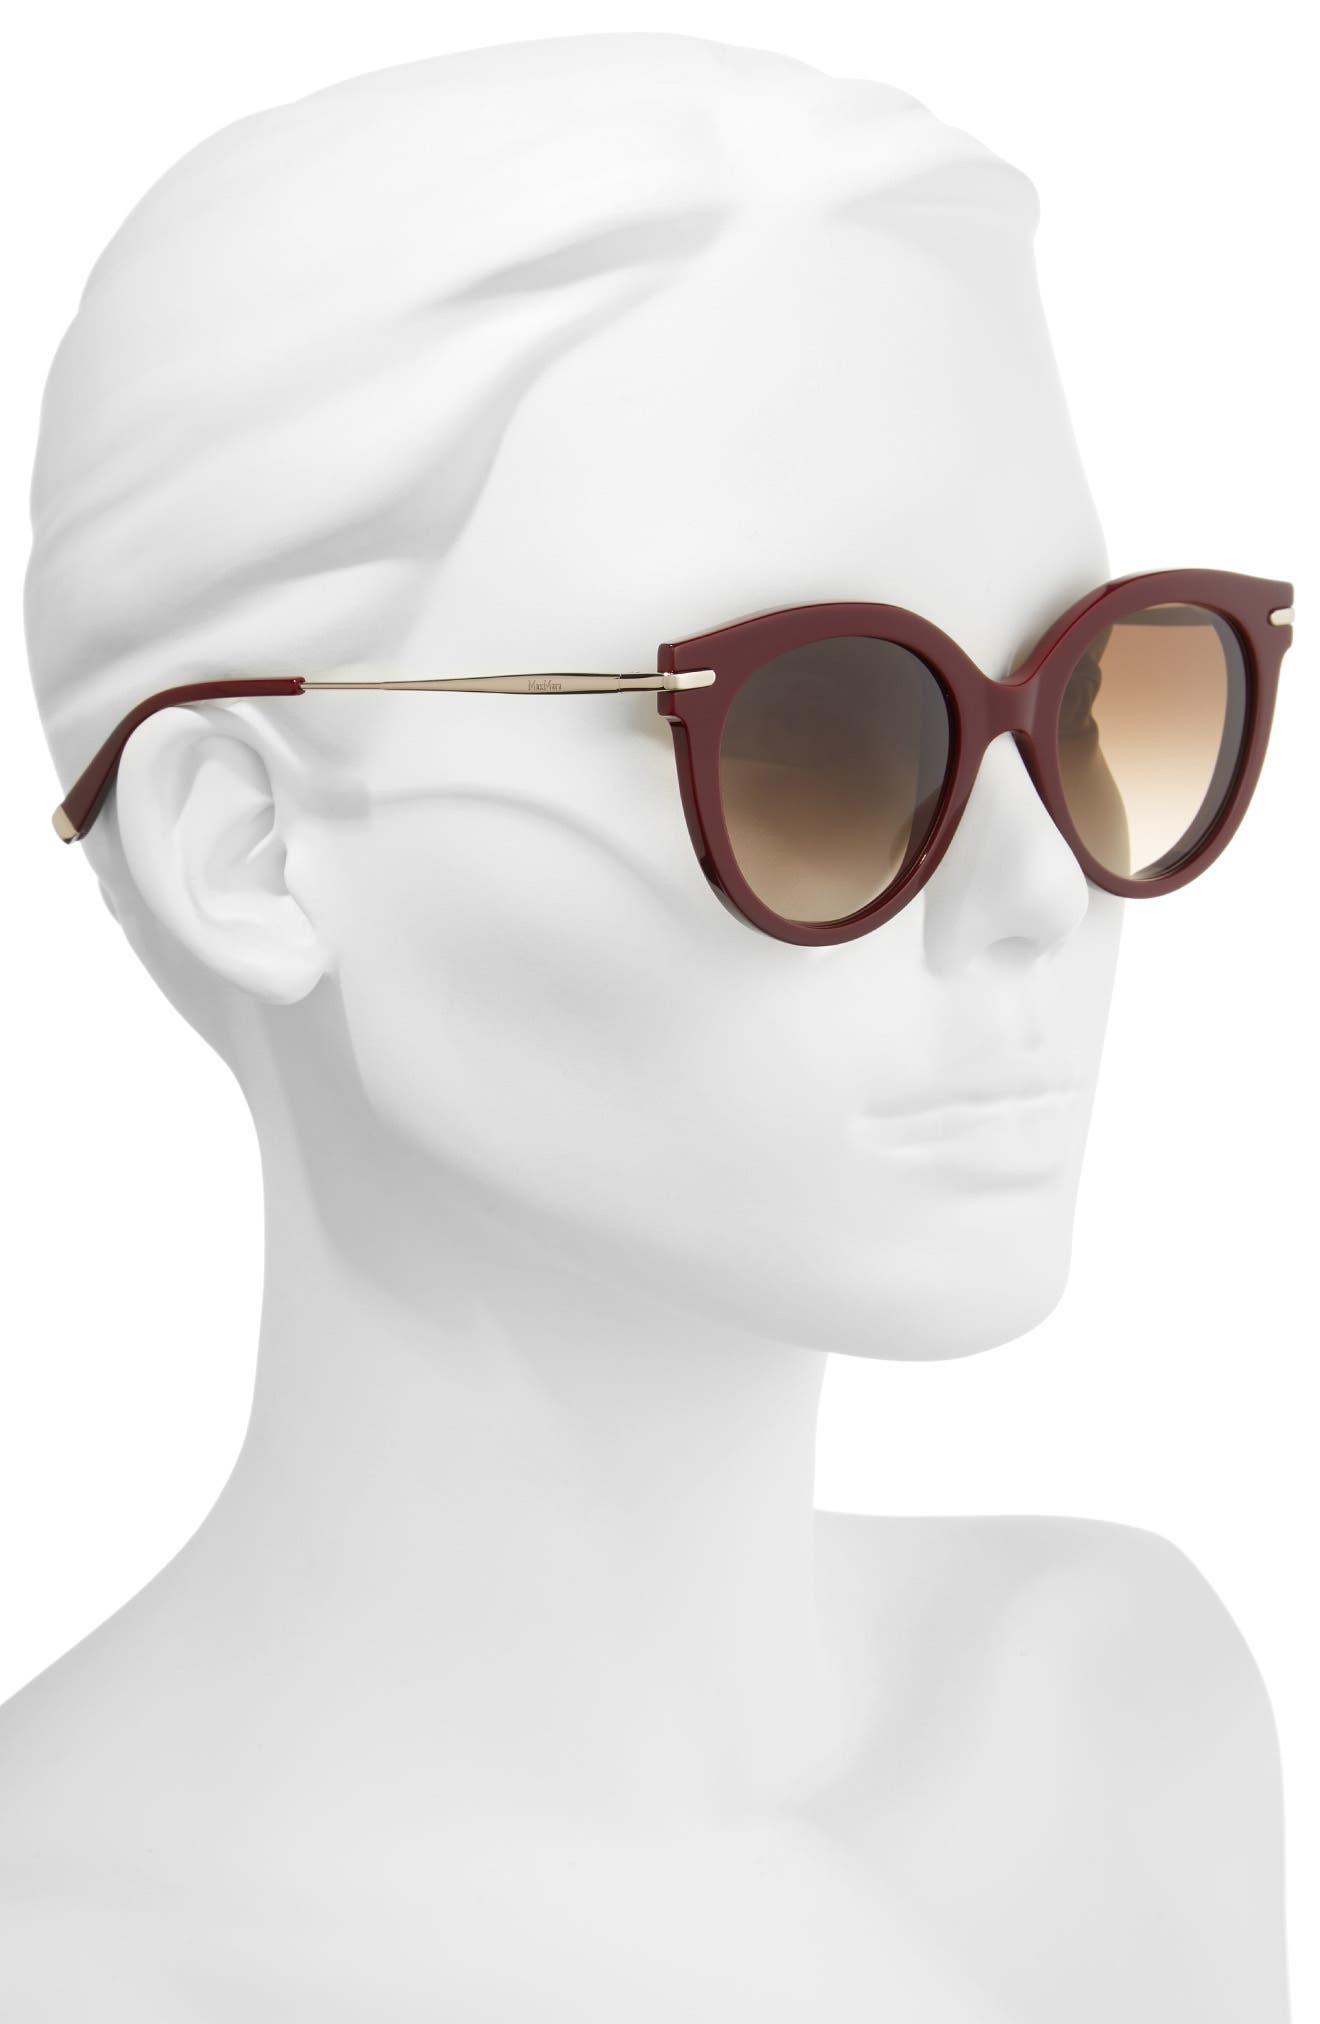 Needle VI 50mm Gradient Round Sunglasses,                             Alternate thumbnail 2, color,                             BURGUNDY GOLD